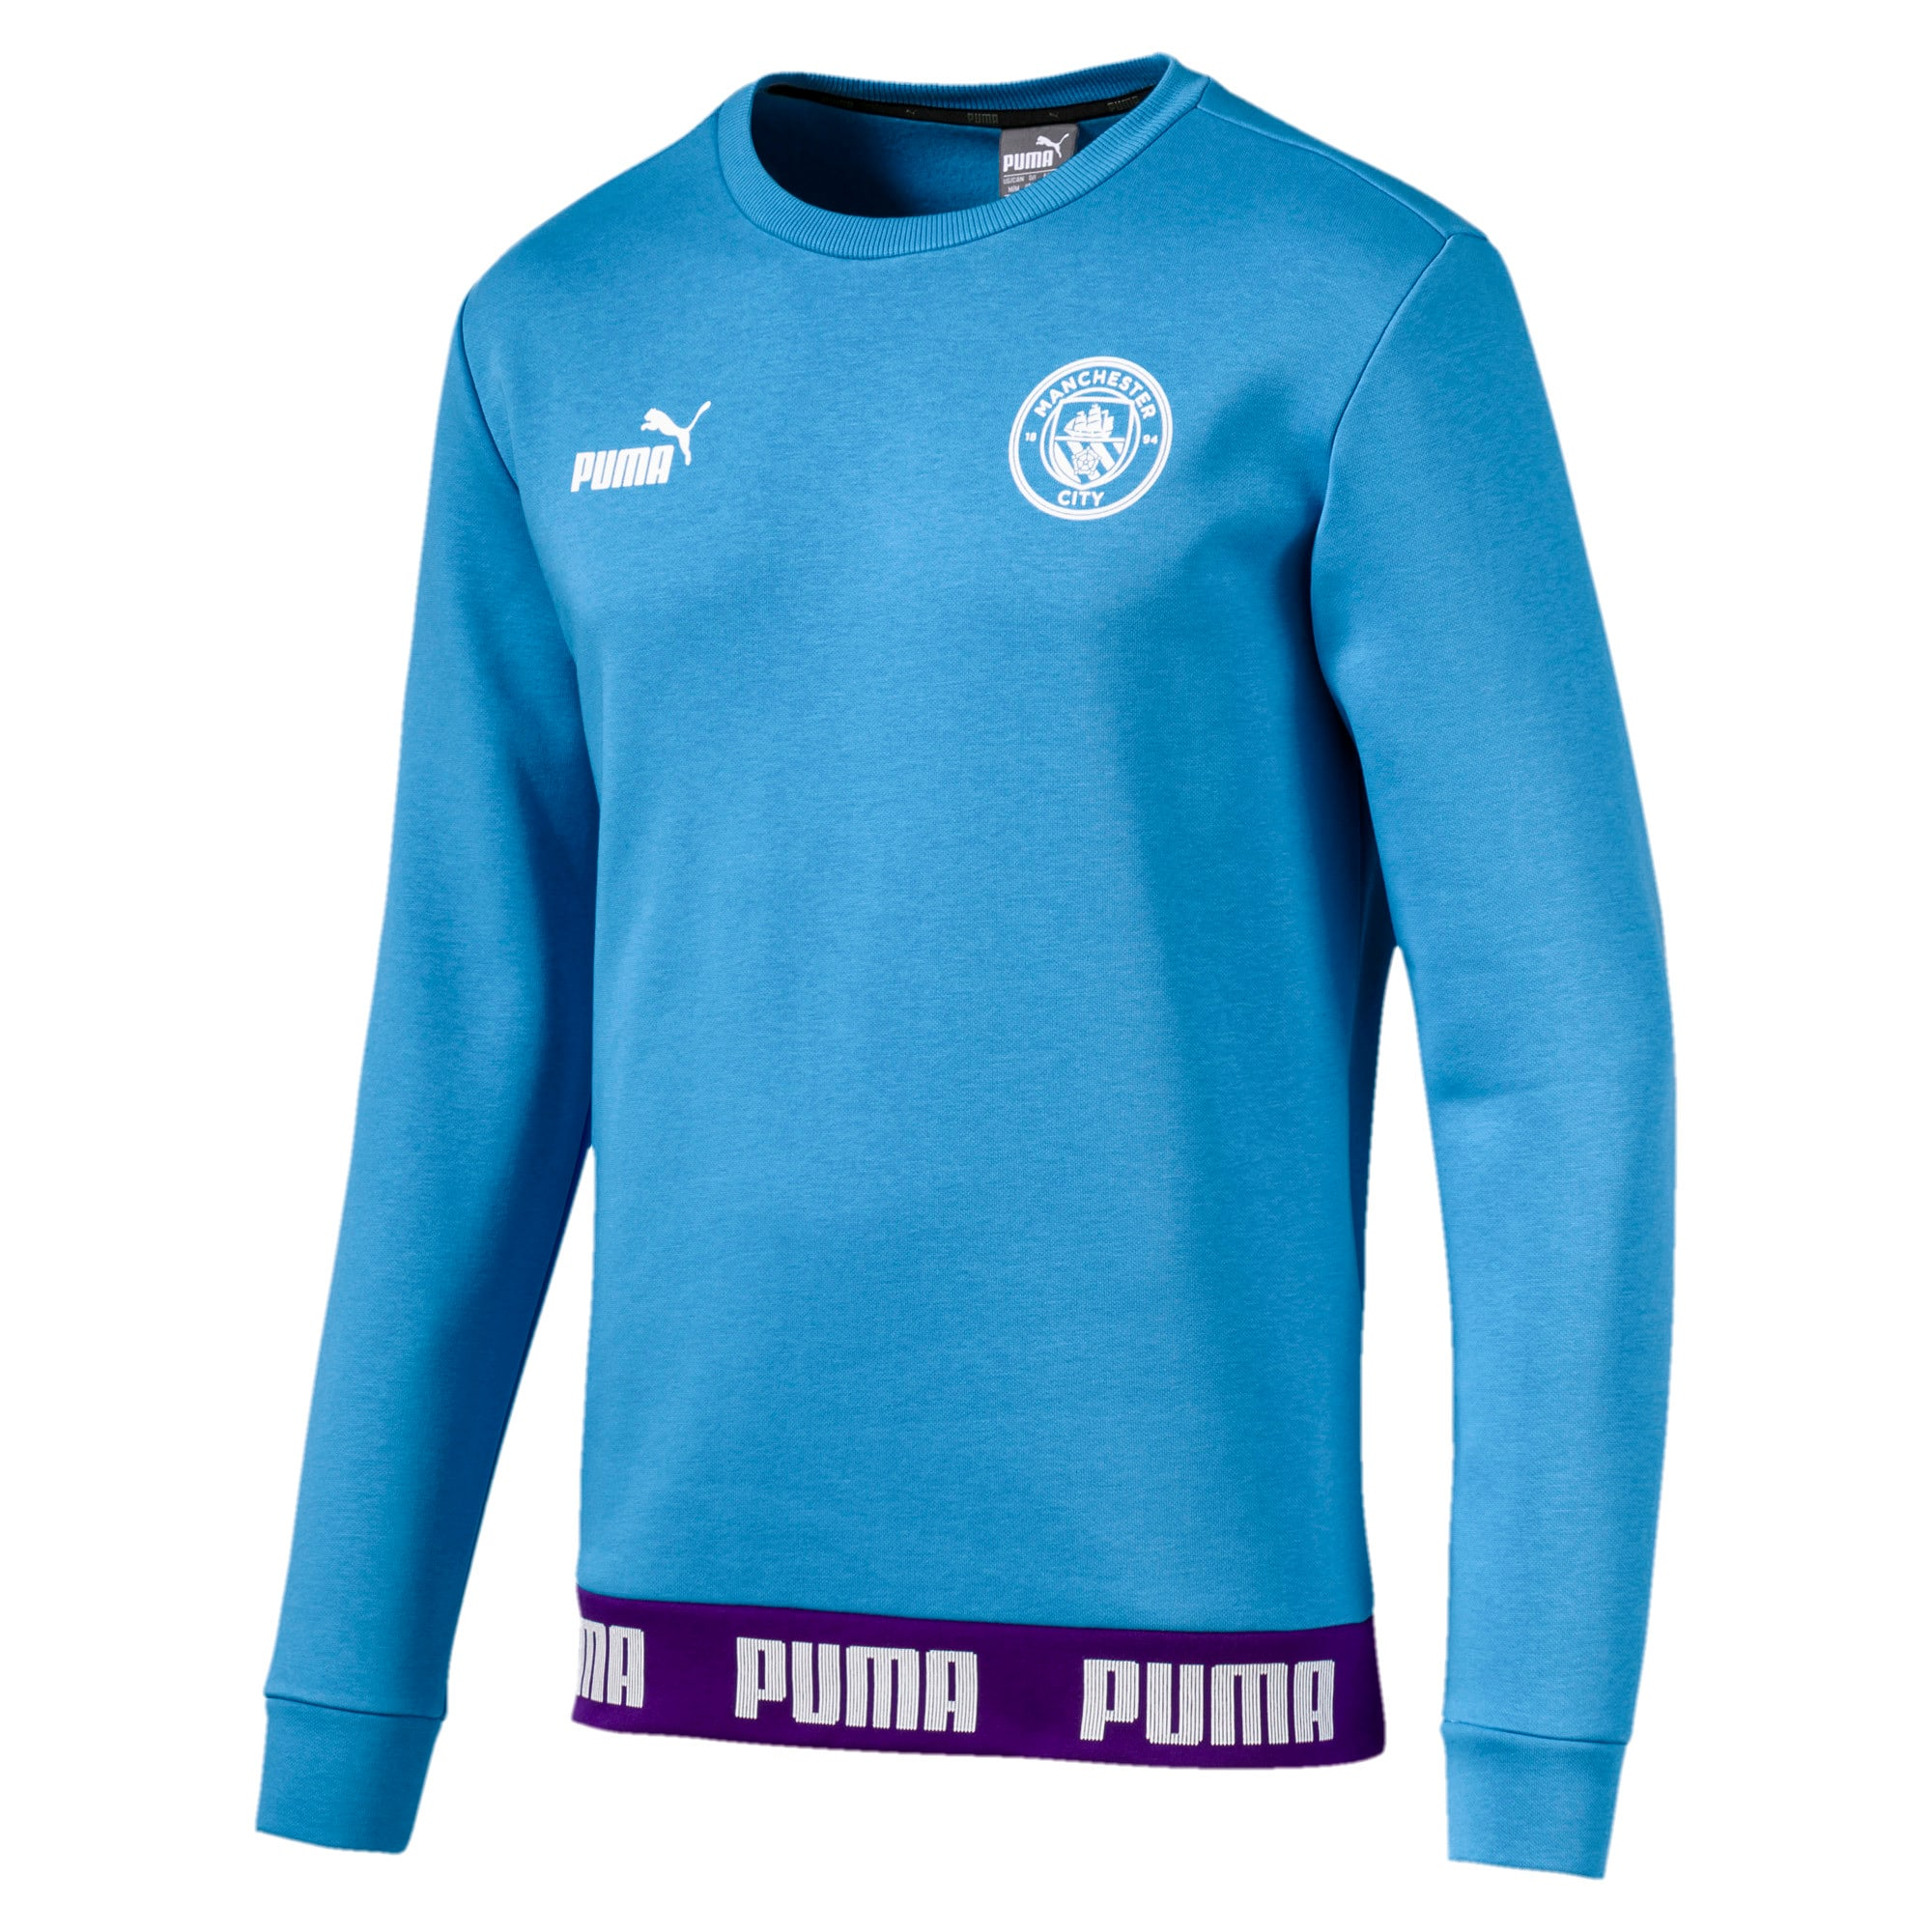 Thumbnail 1 of Manchester City Football Culture Herren Sweatshirt, Team Light Blue-Puma White, medium